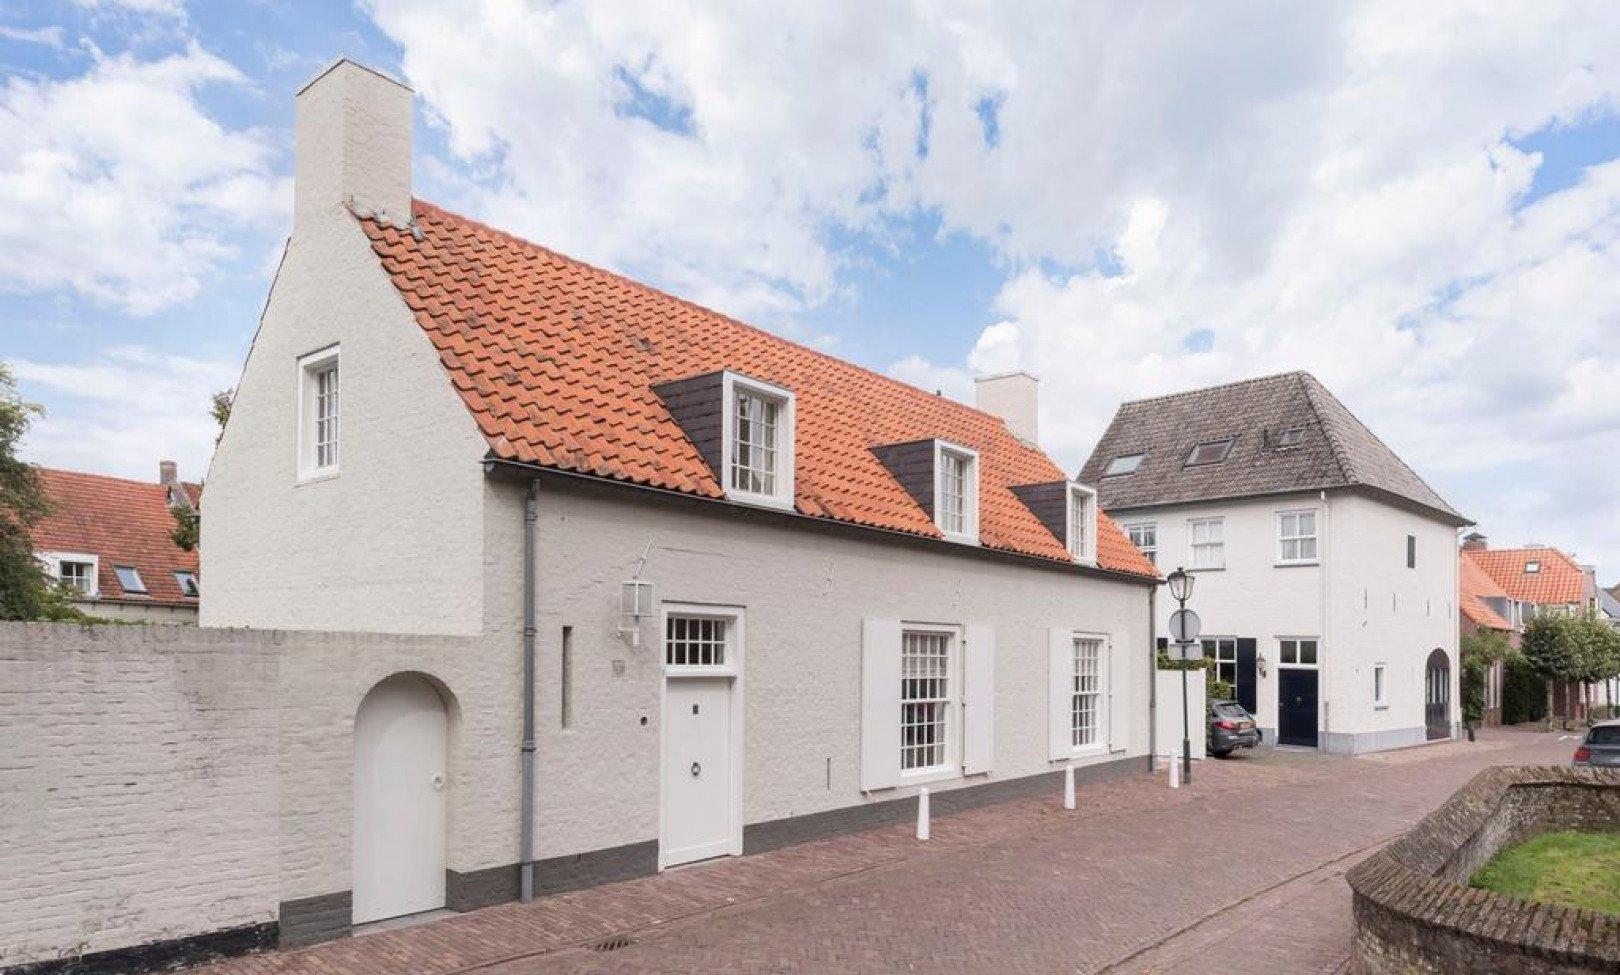 Hilvarenbeek, Kapittelstraat 1